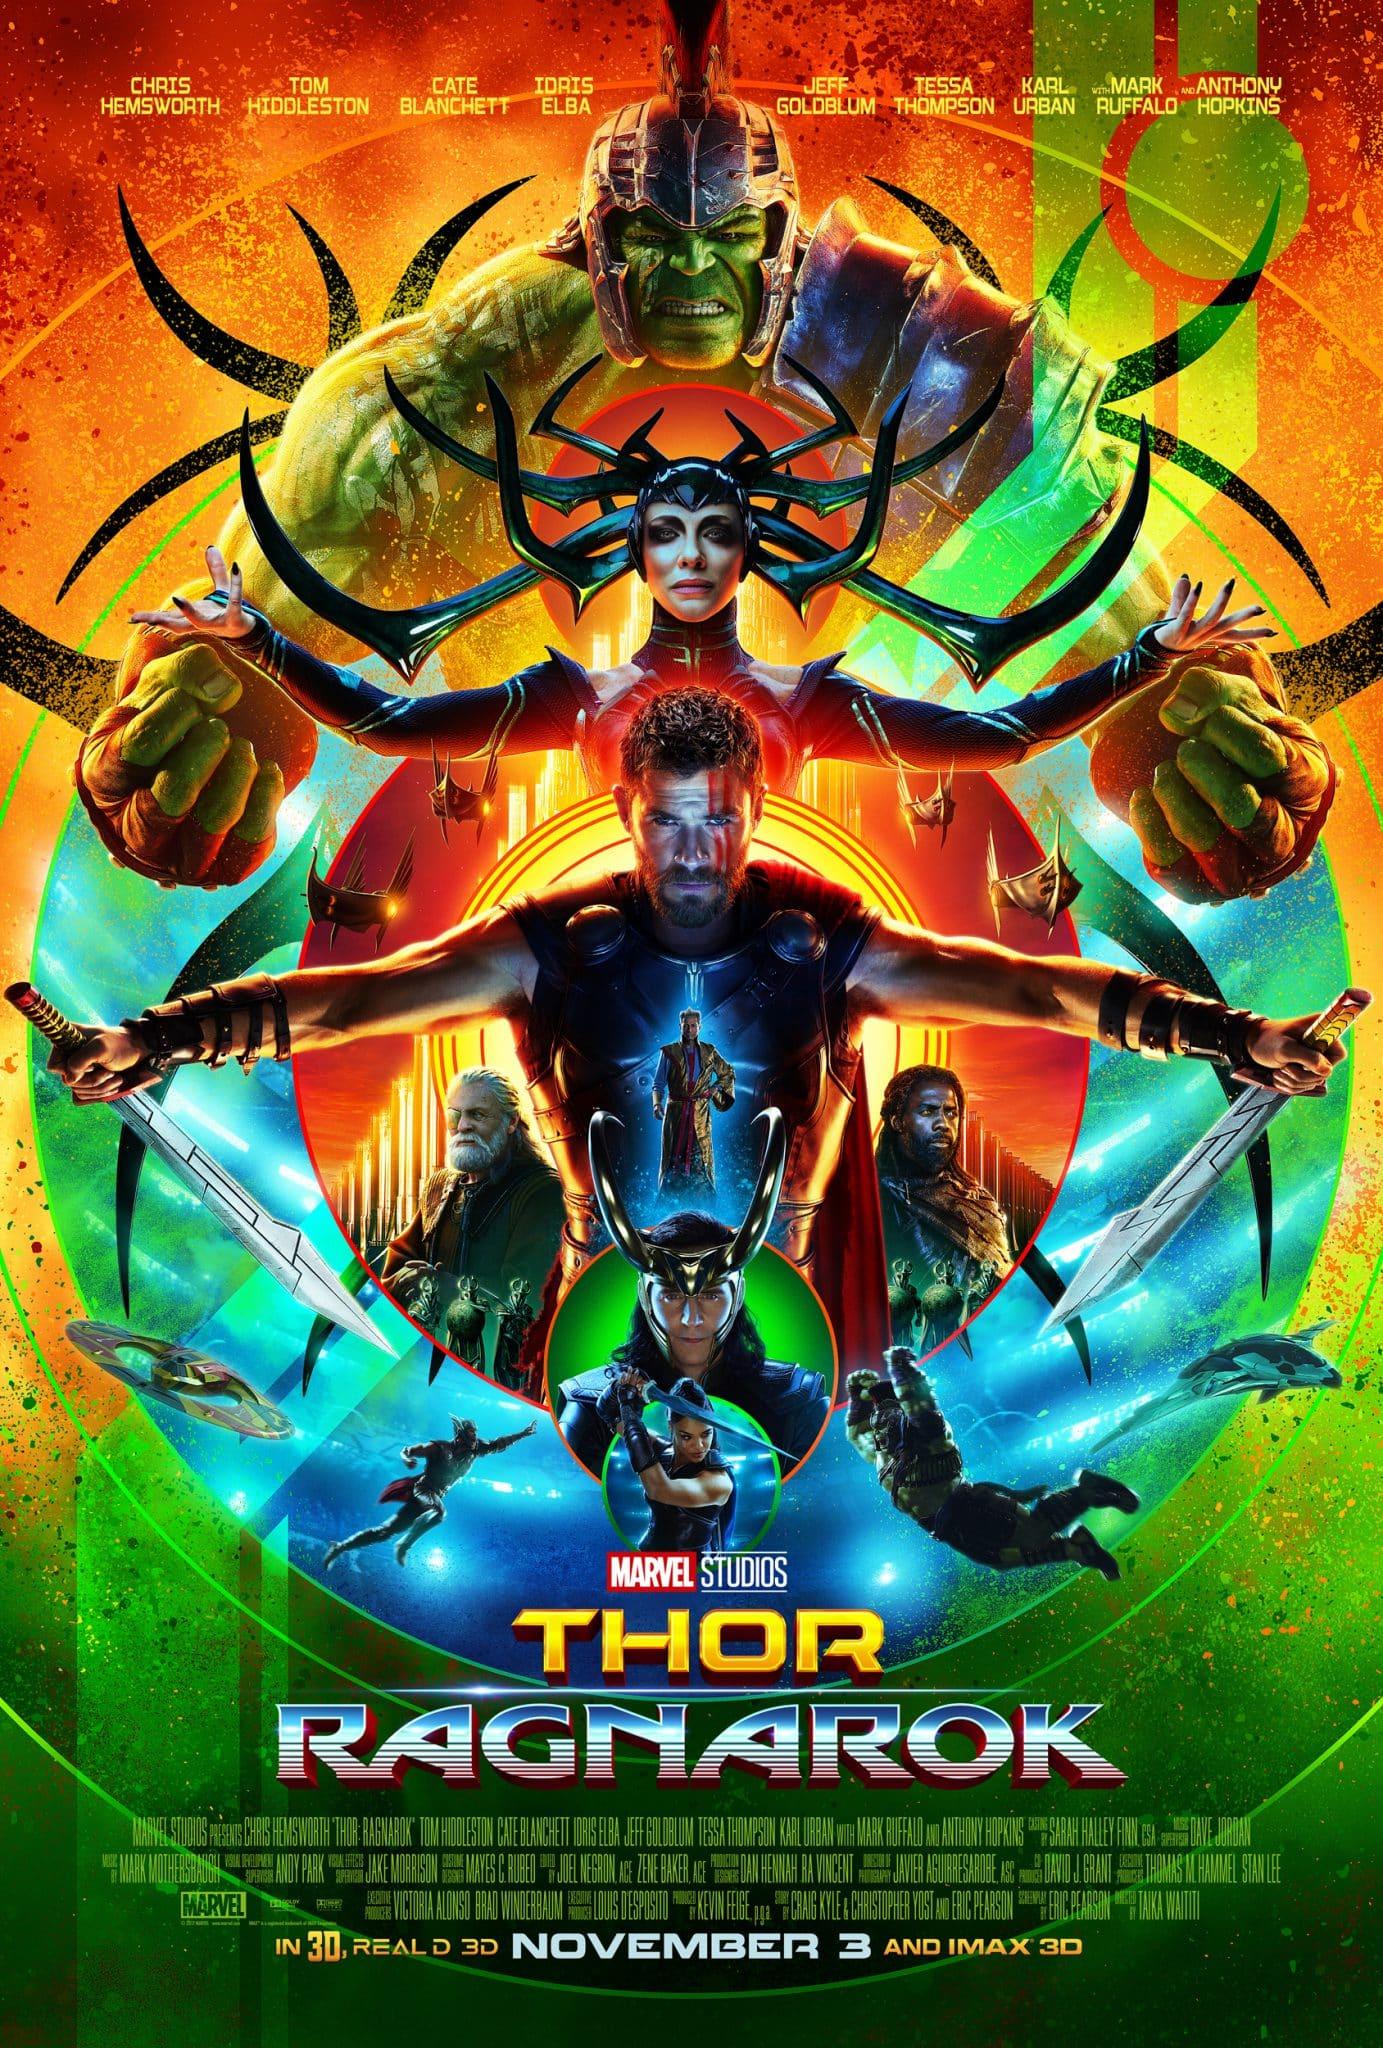 THOR: RAGNAROK New Featurette Now Available!!! #ThorRagnarok